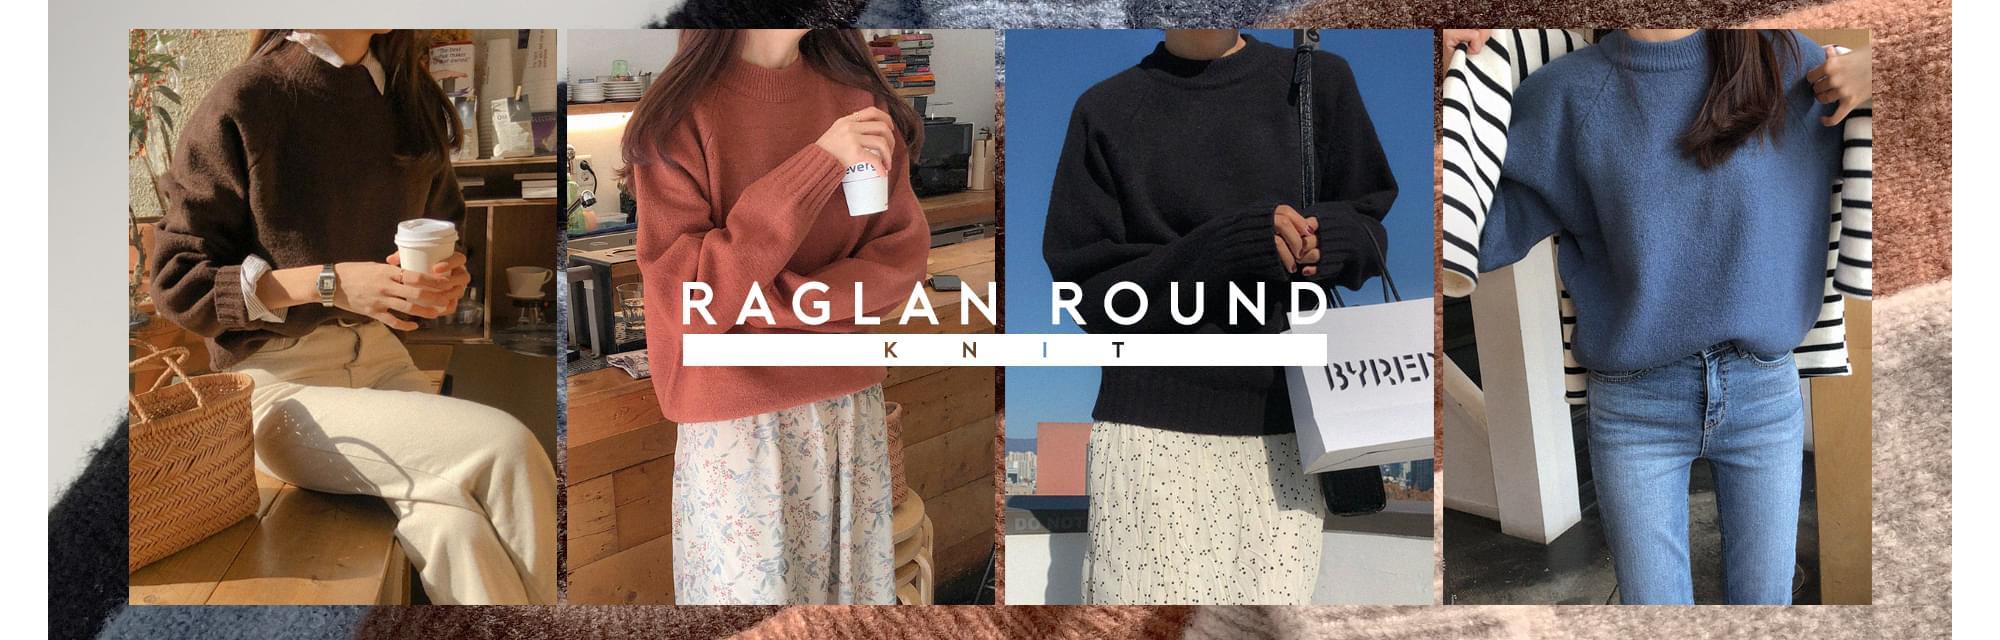 Knit Raglan Knit